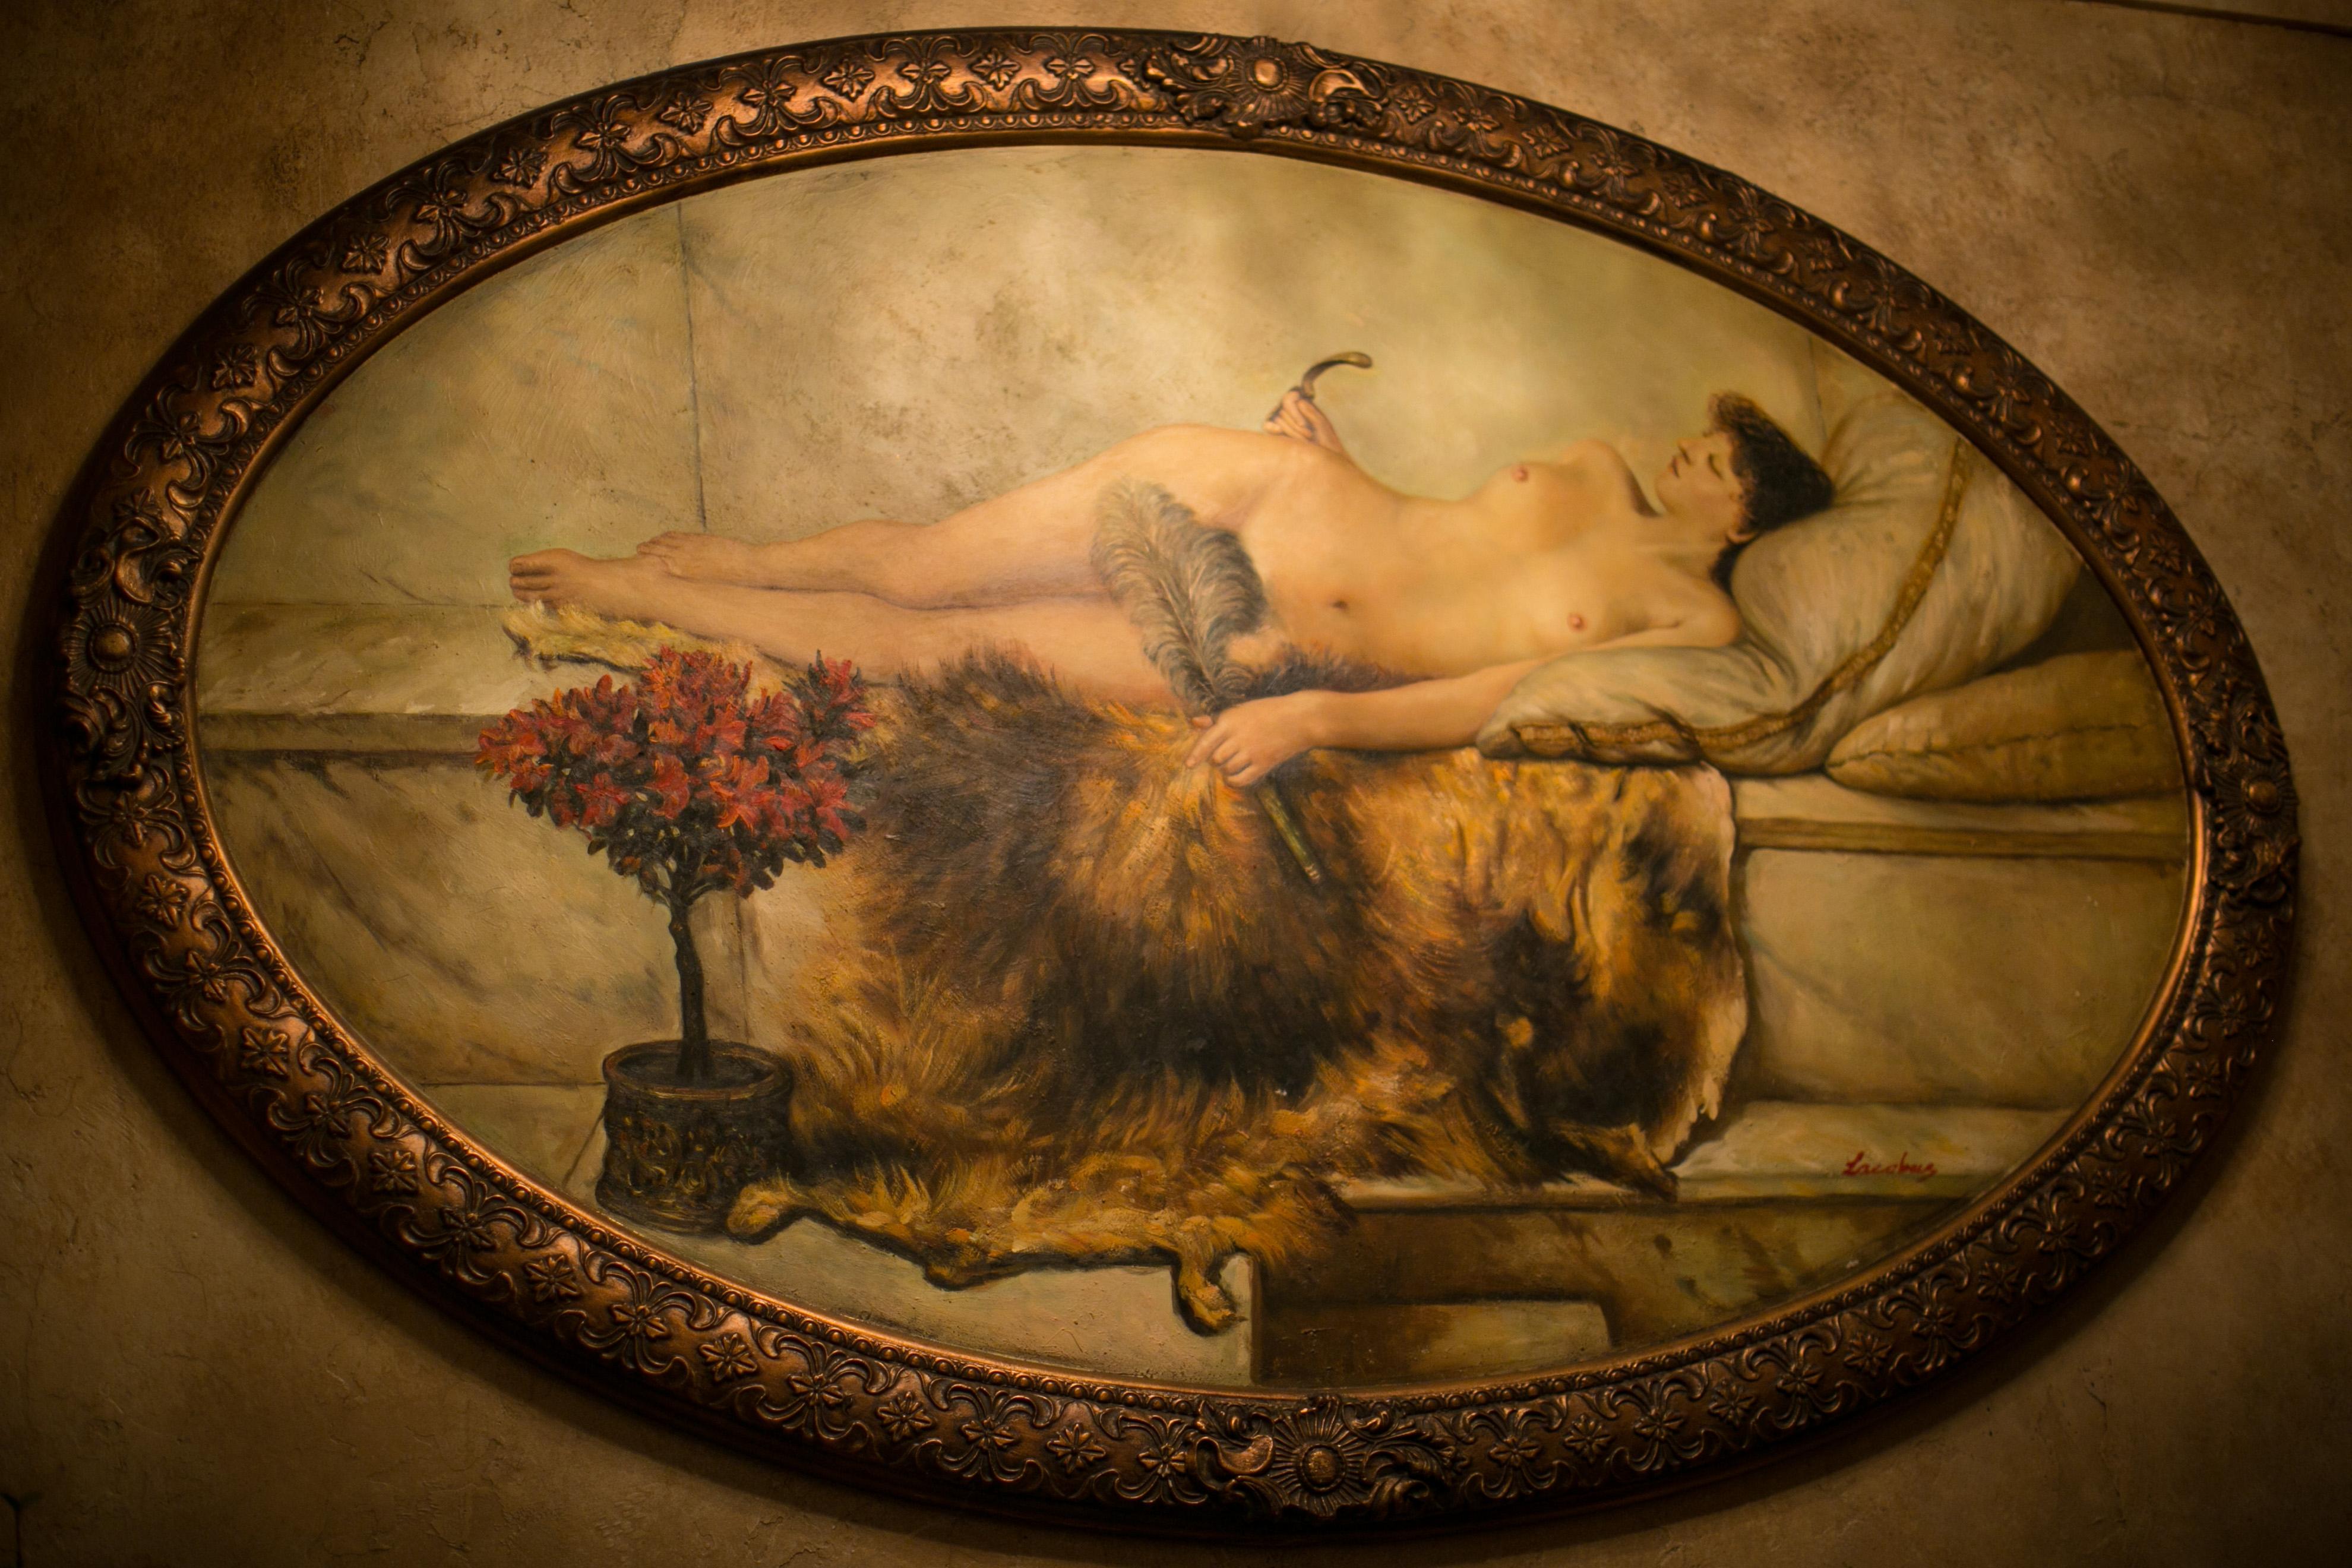 The Lodge Vintage Brothel Painting